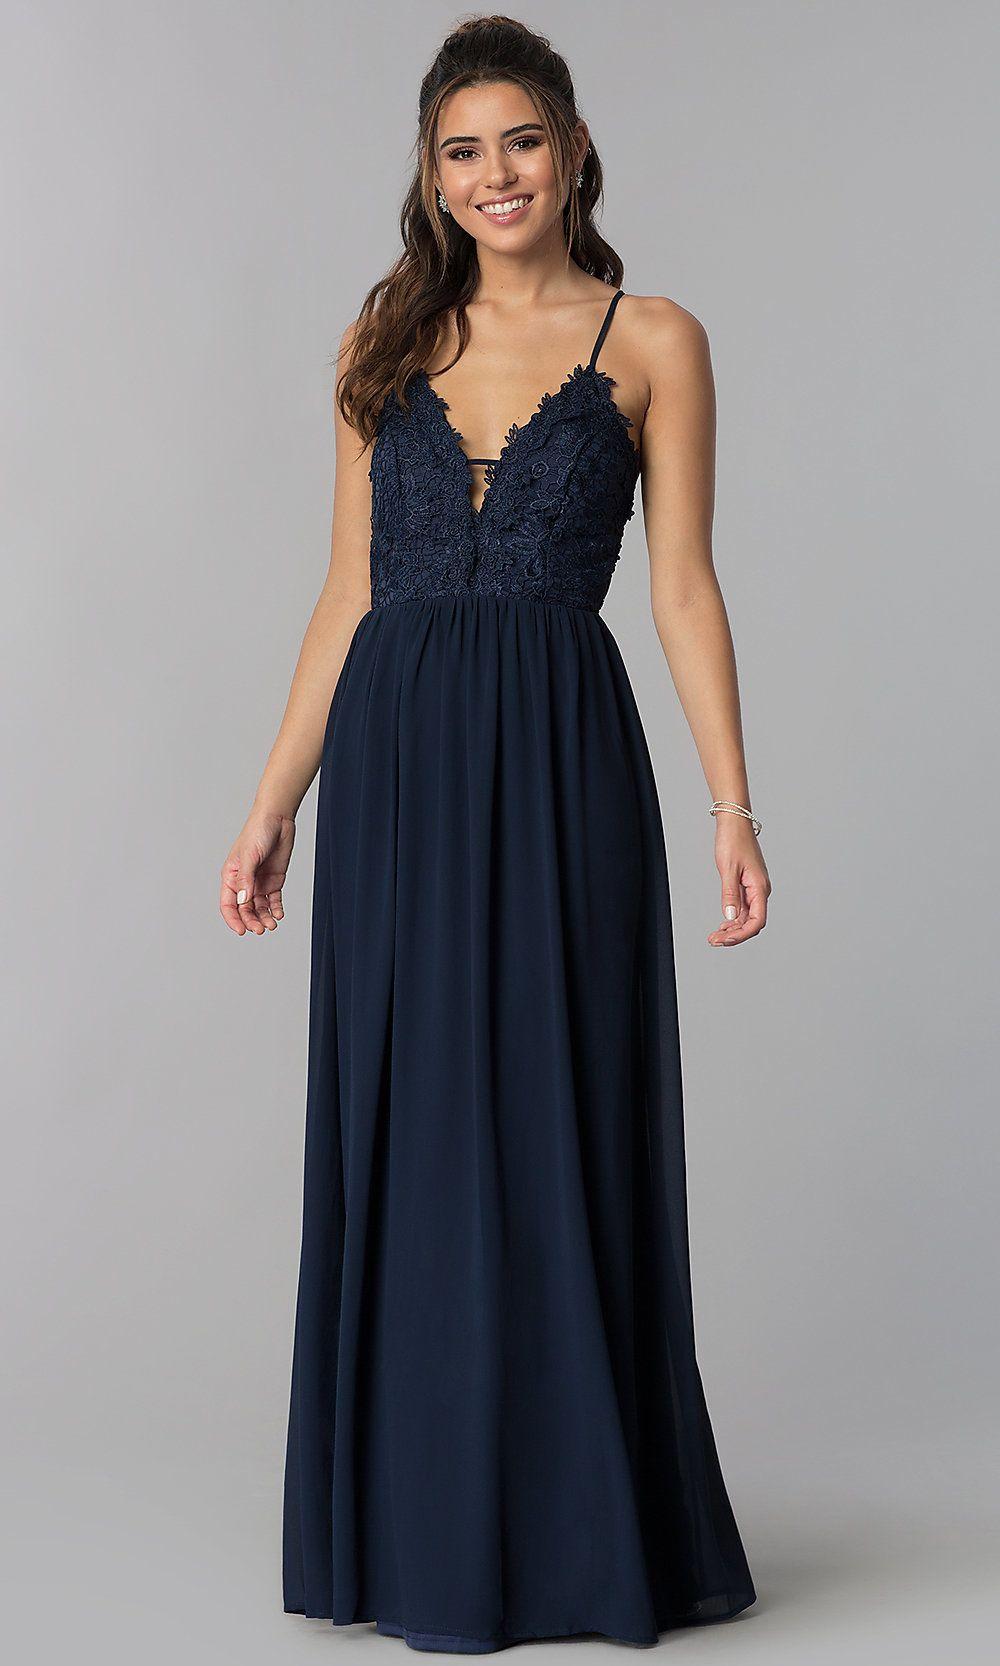 d5de725e65 Long V-Neck Embroidered-Lace-Bodice Prom Dress